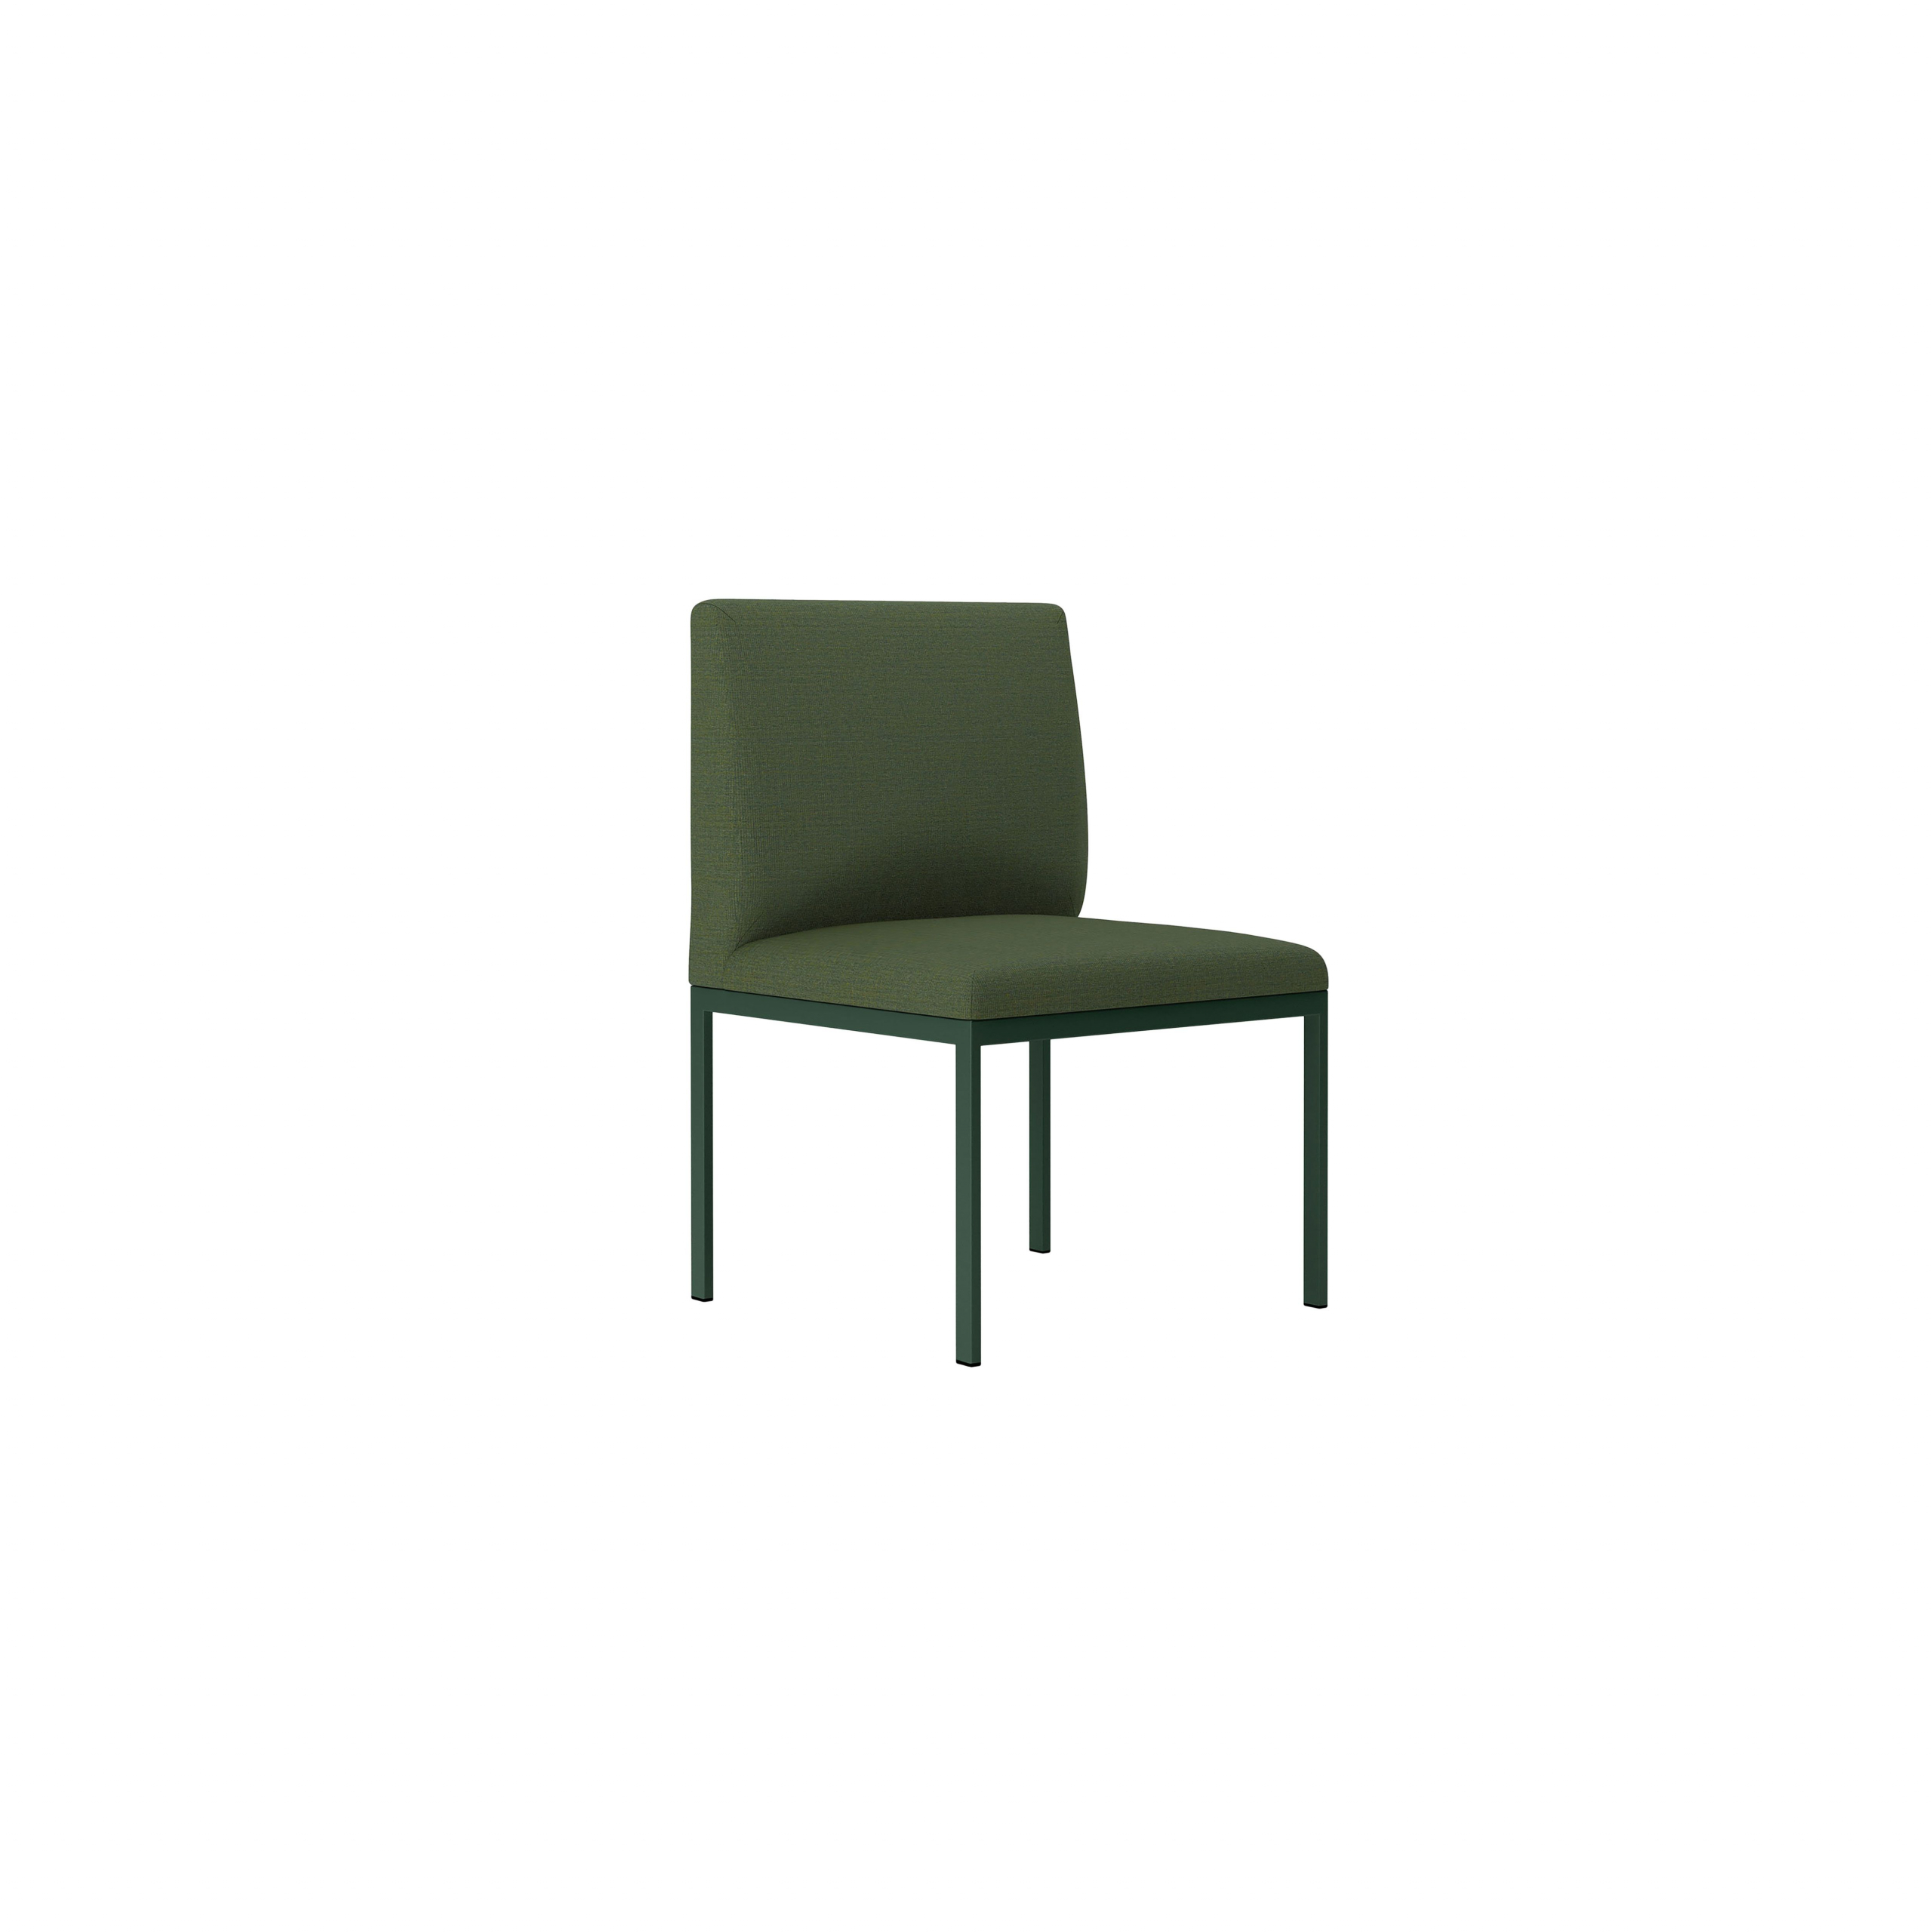 Create Seating Soffa produktbild 3